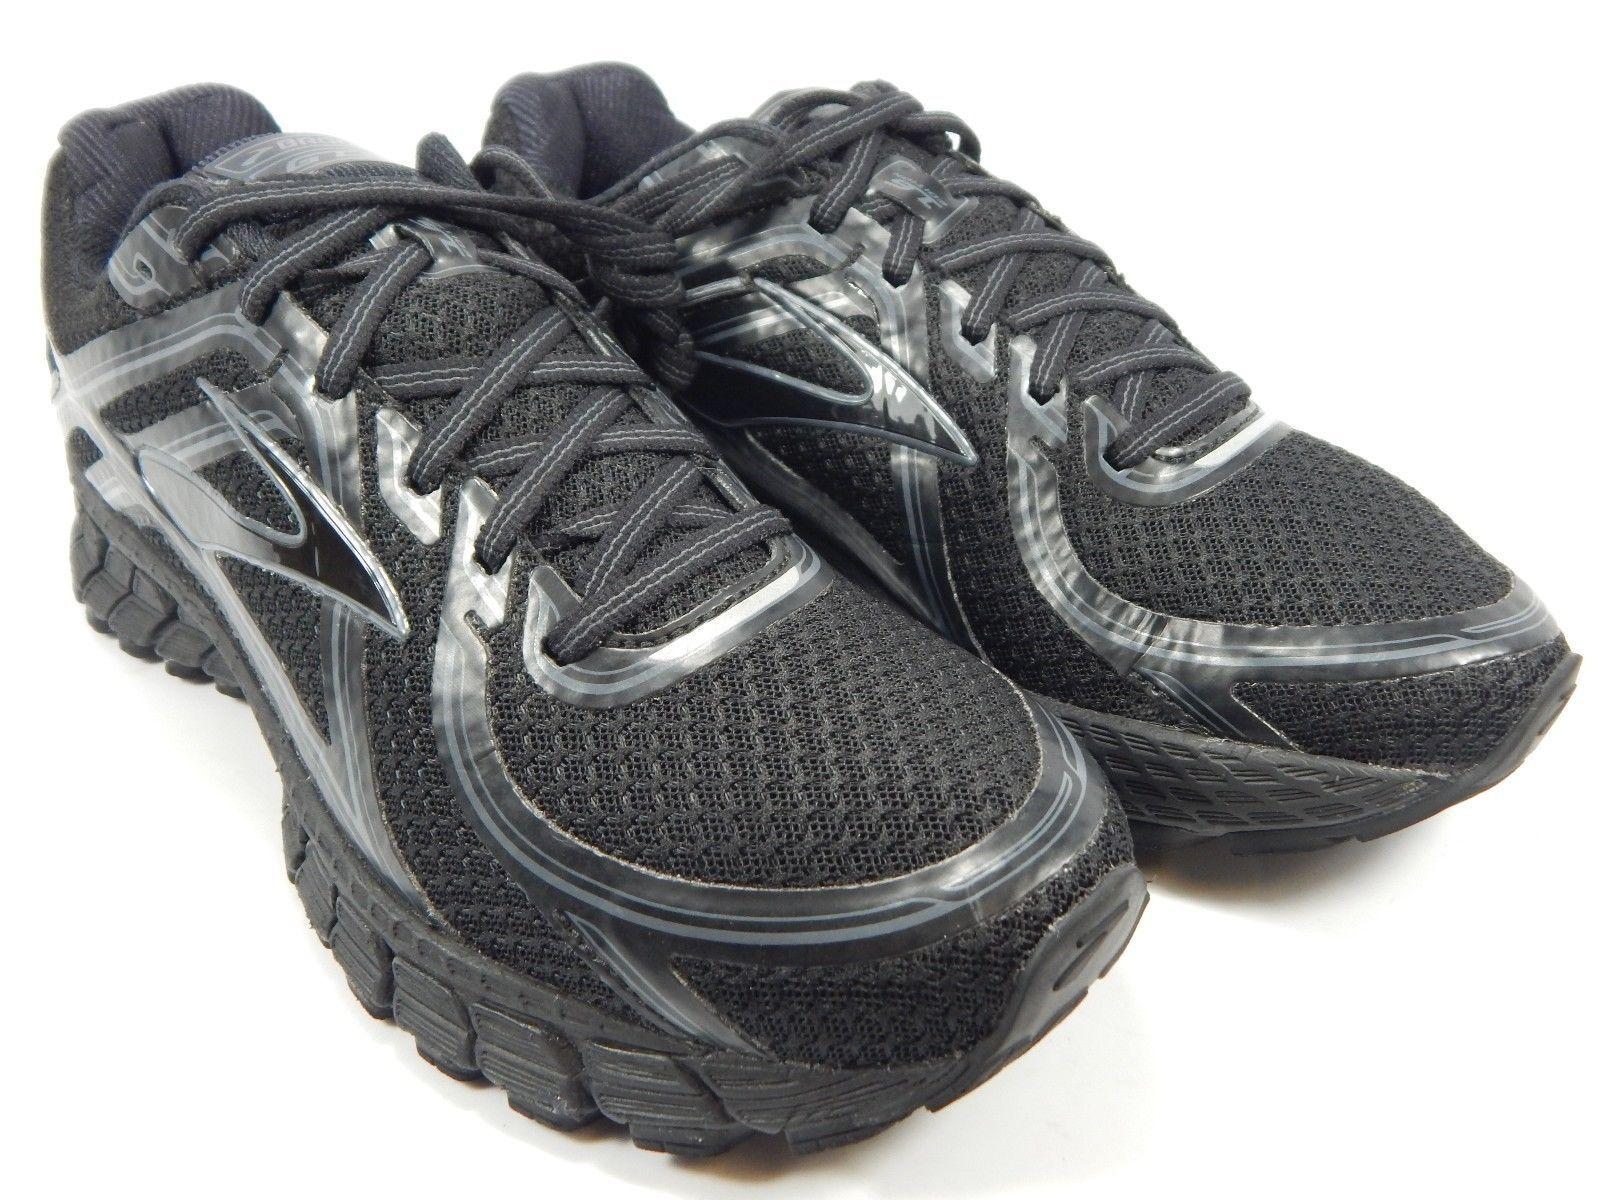 check out 7a4c3 0fe1f Brooks GTS 16 Women s Running Shoe Size US 9.5 M (B) EU 41 Black ...